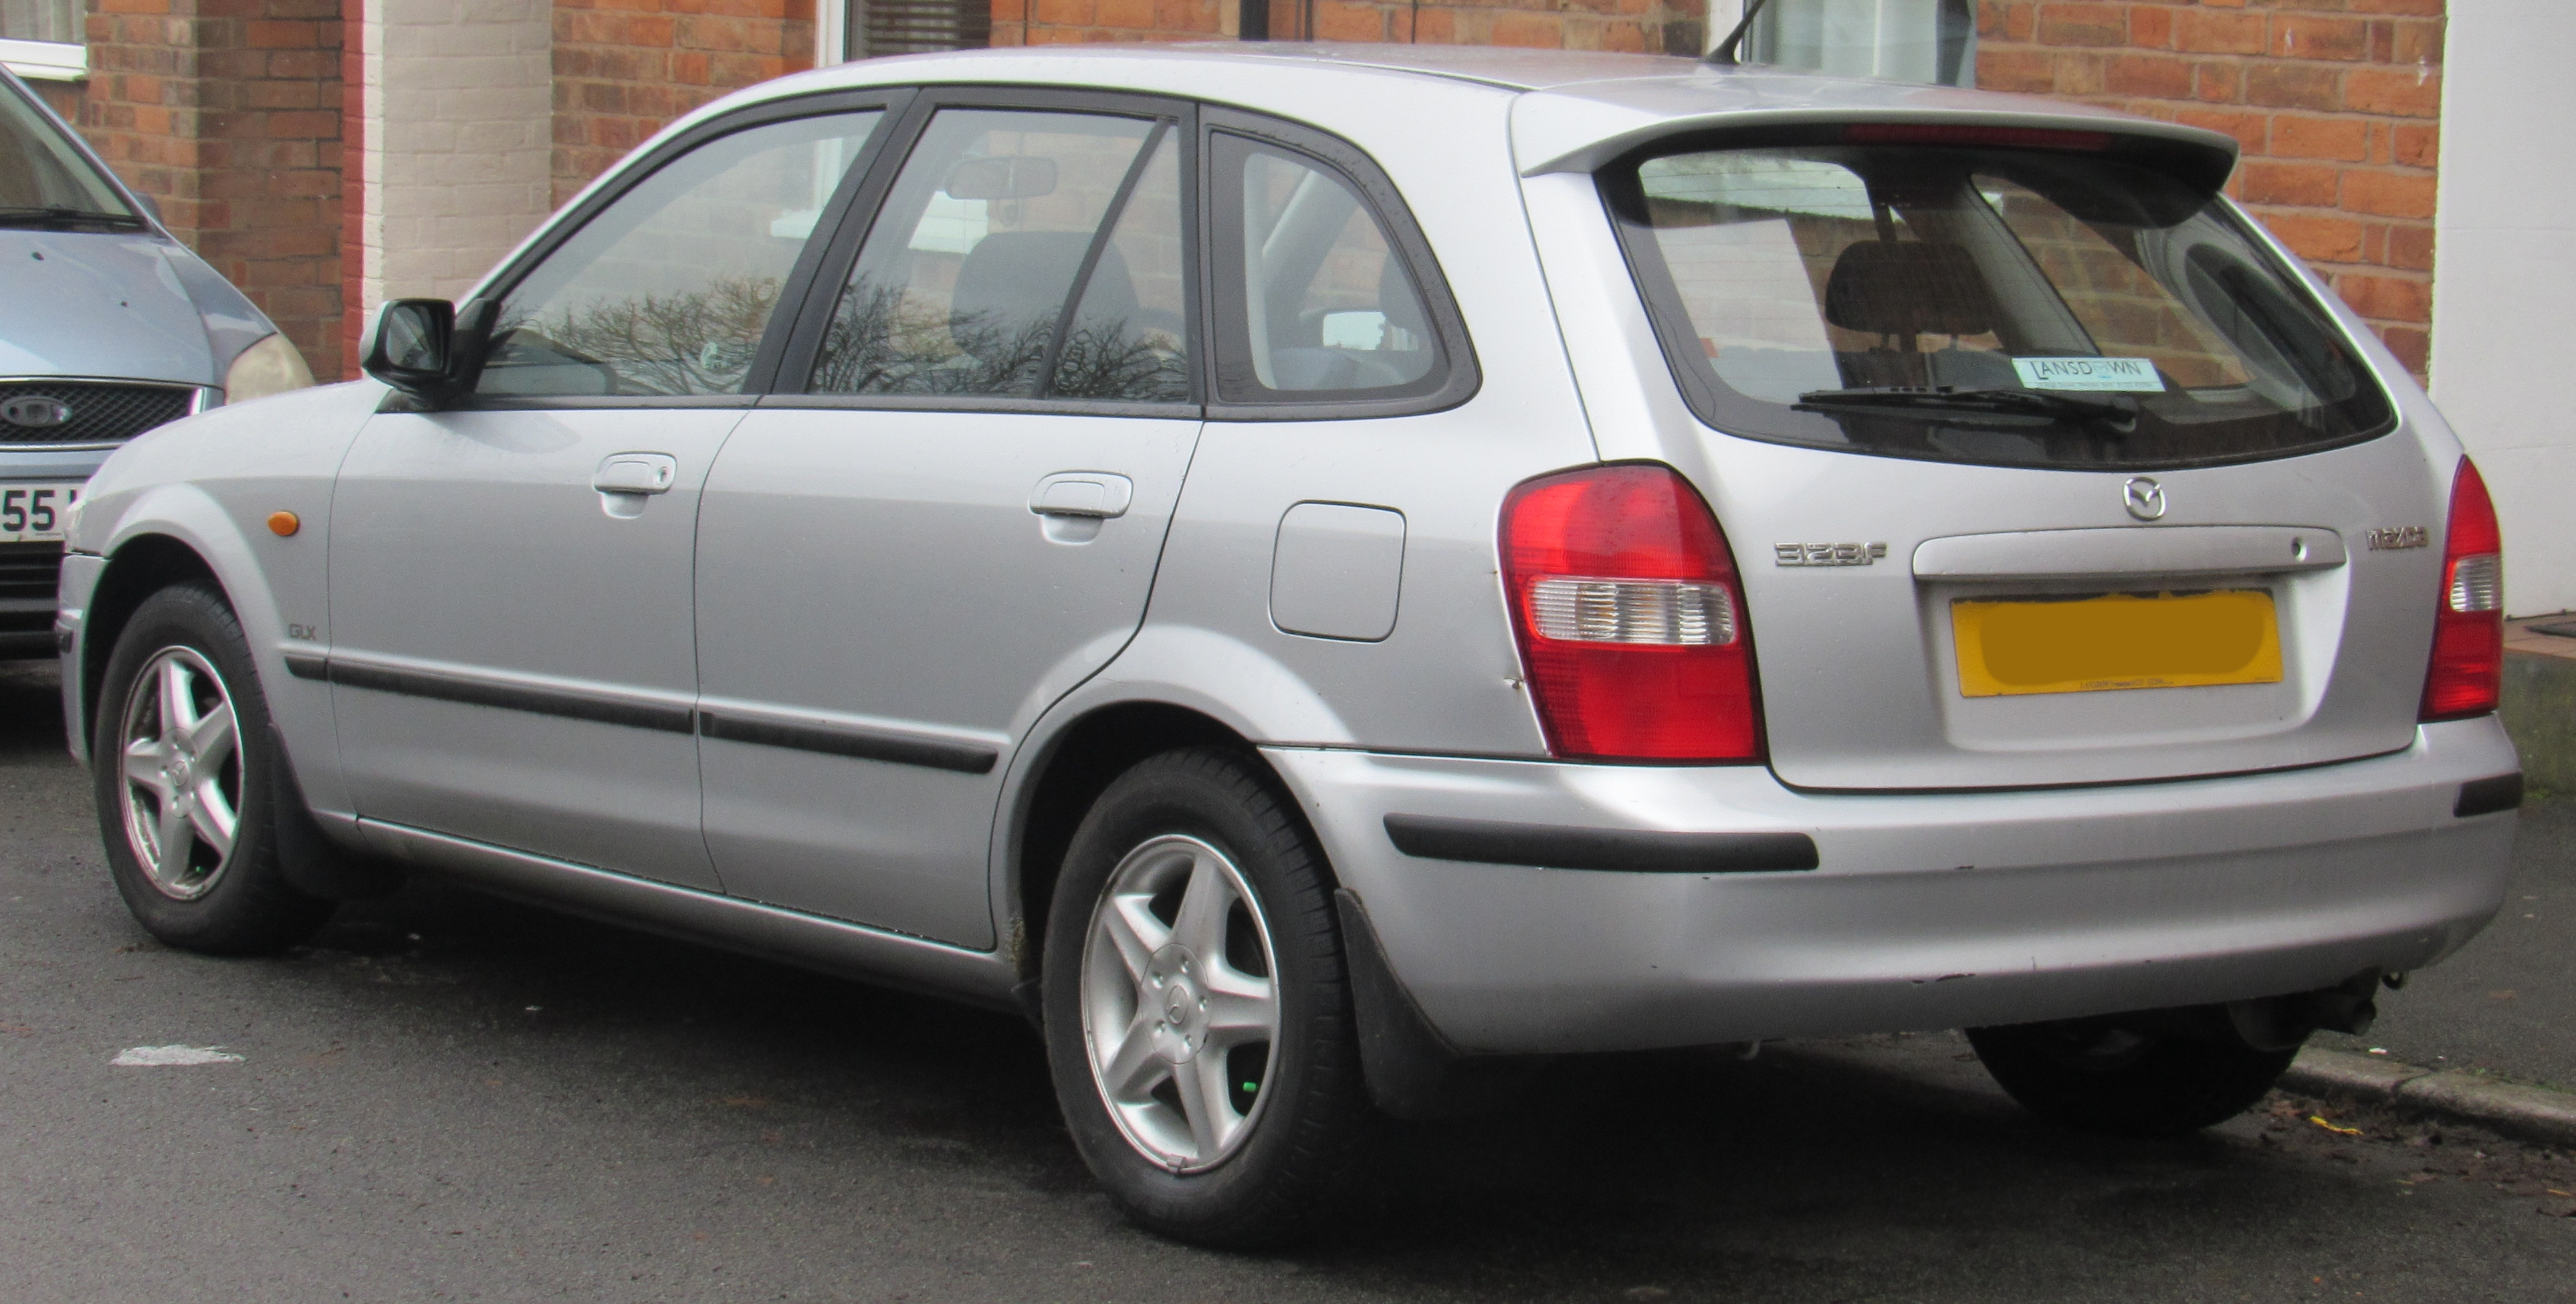 https://upload.wikimedia.org/wikipedia/commons/b/bc/2000_Mazda_323F_1.5_Rear.jpg